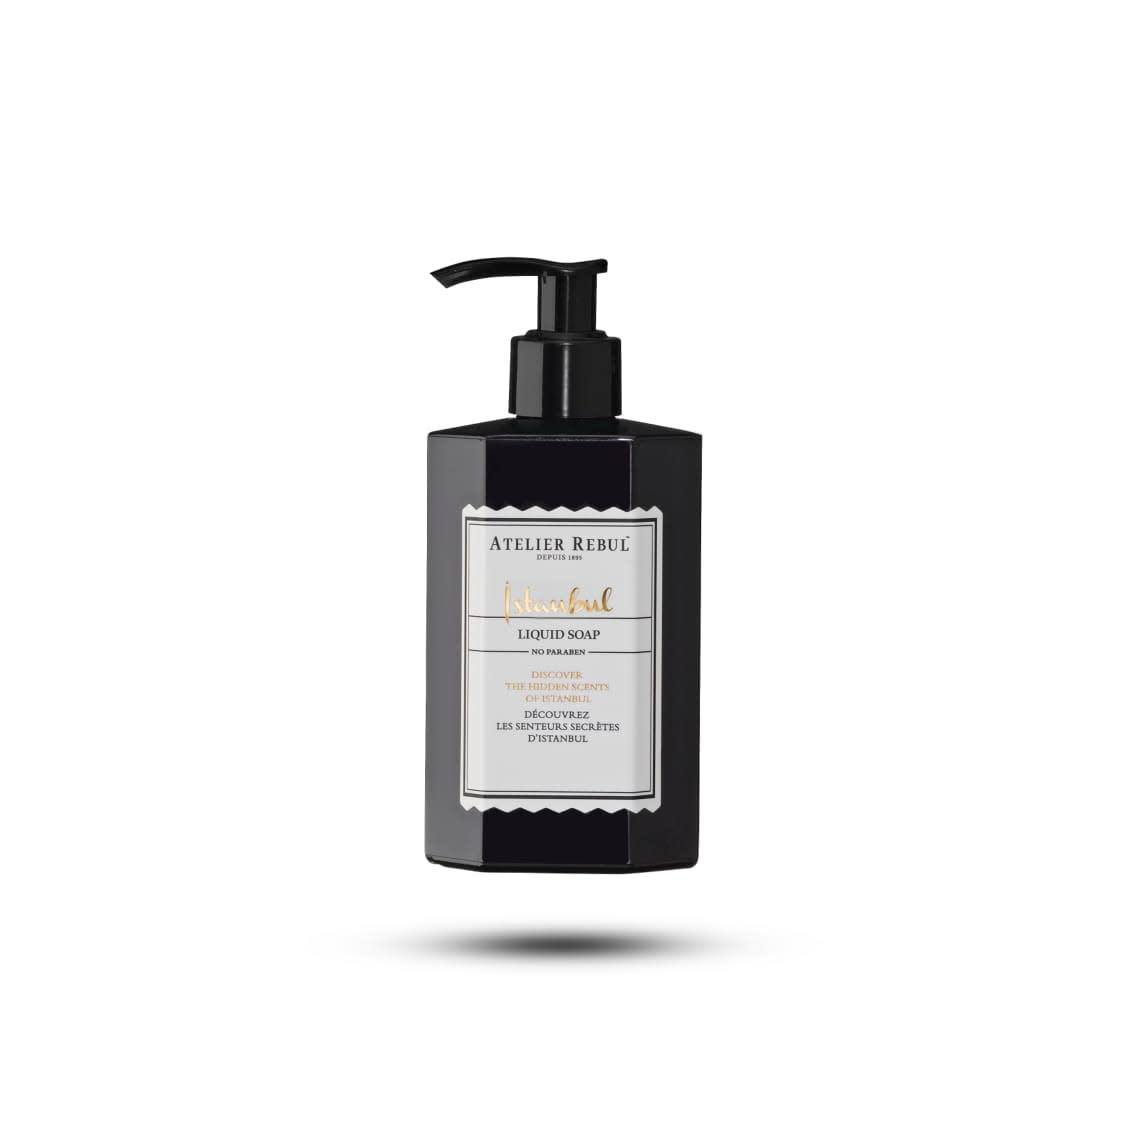 Atelier Rebul Atelier Rebul Istanbul liquid soap 250 ml.